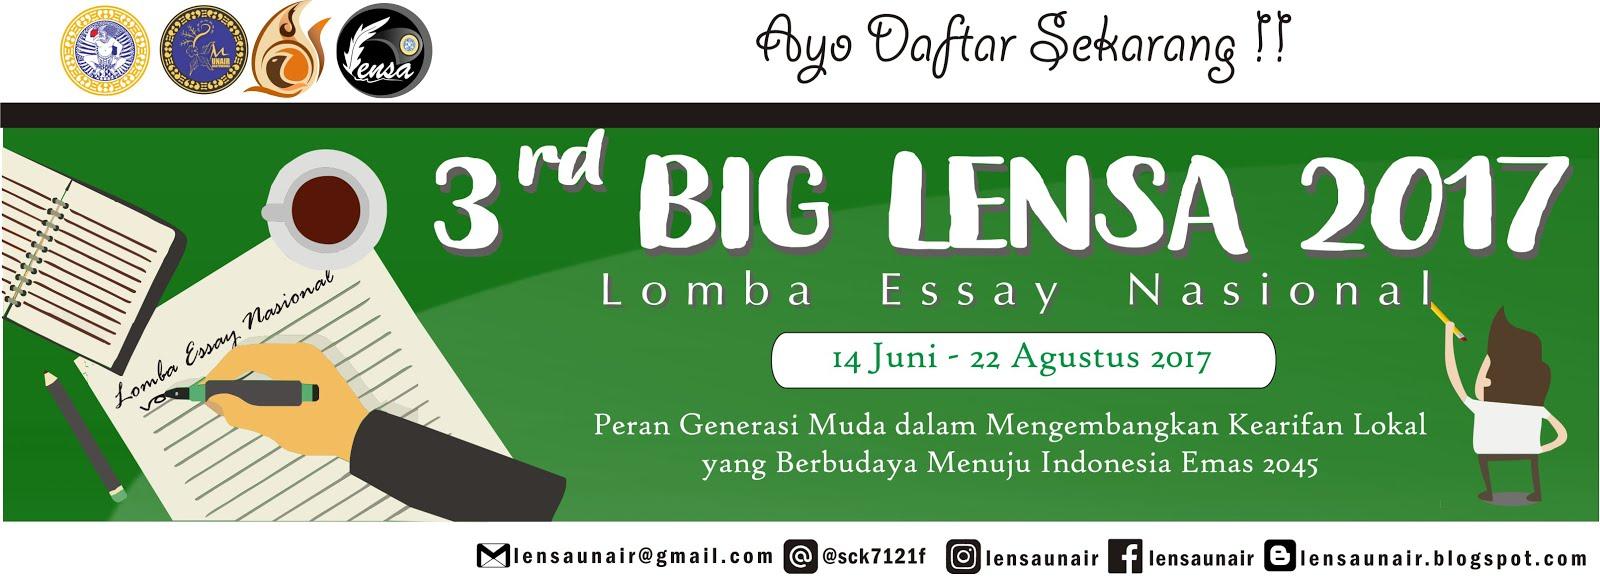 Big Lomba Essay Nasional 2017